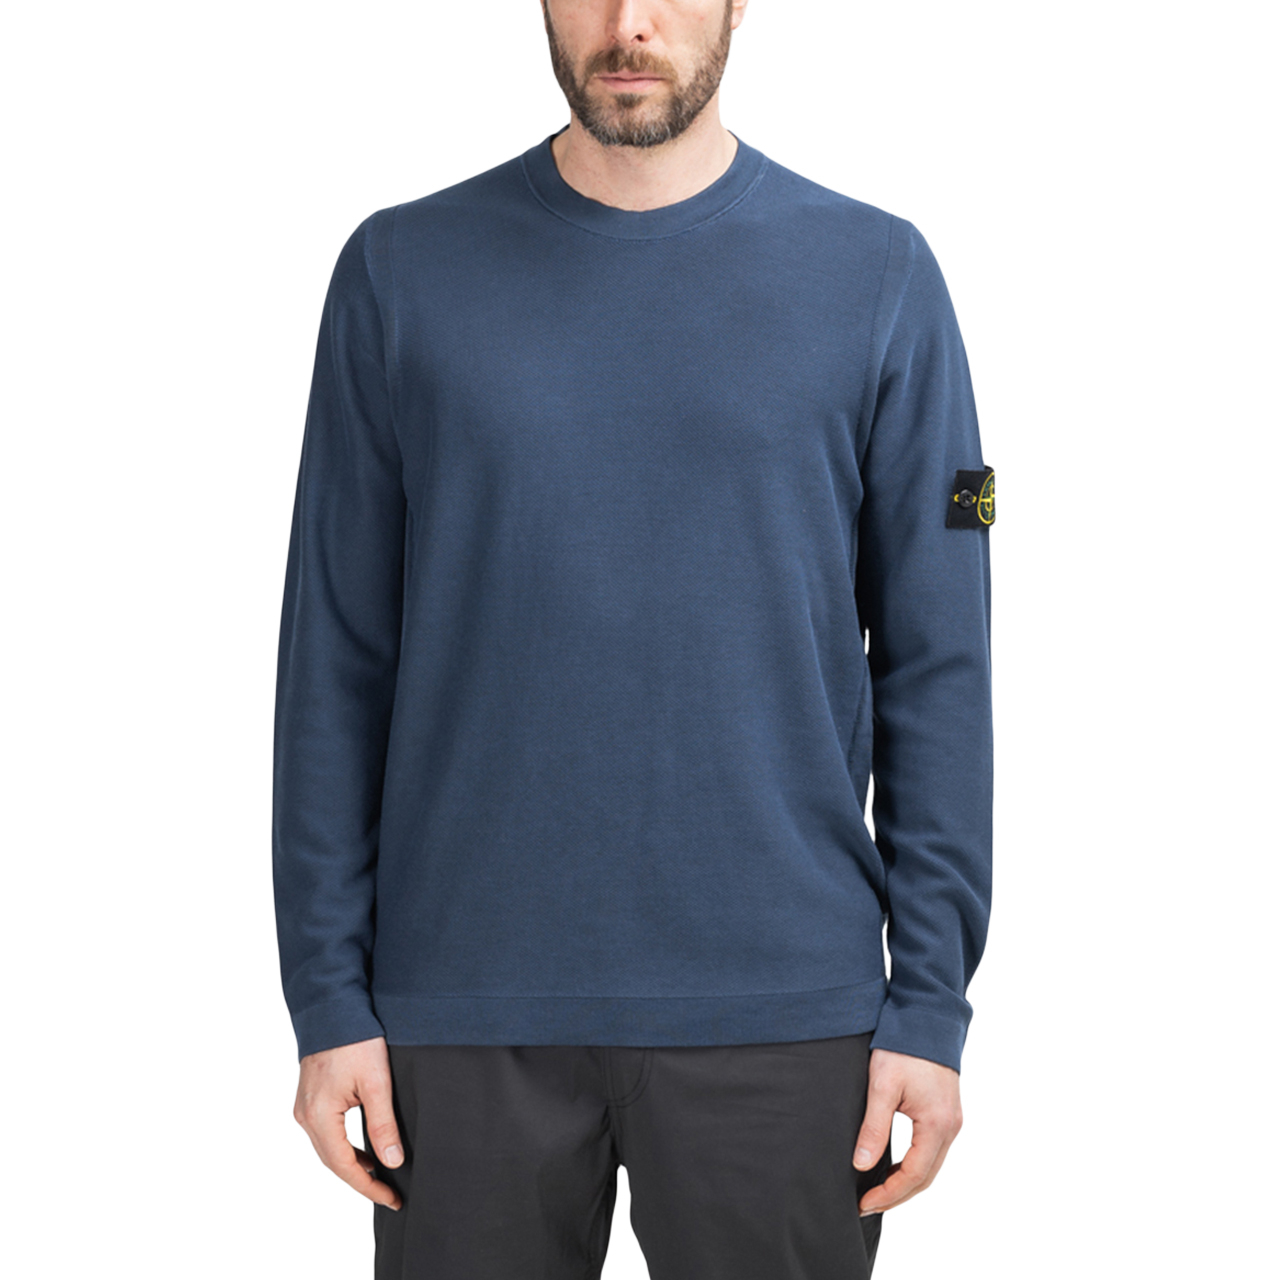 Stone Island Pigment DYE Knit Pullover (Navy)